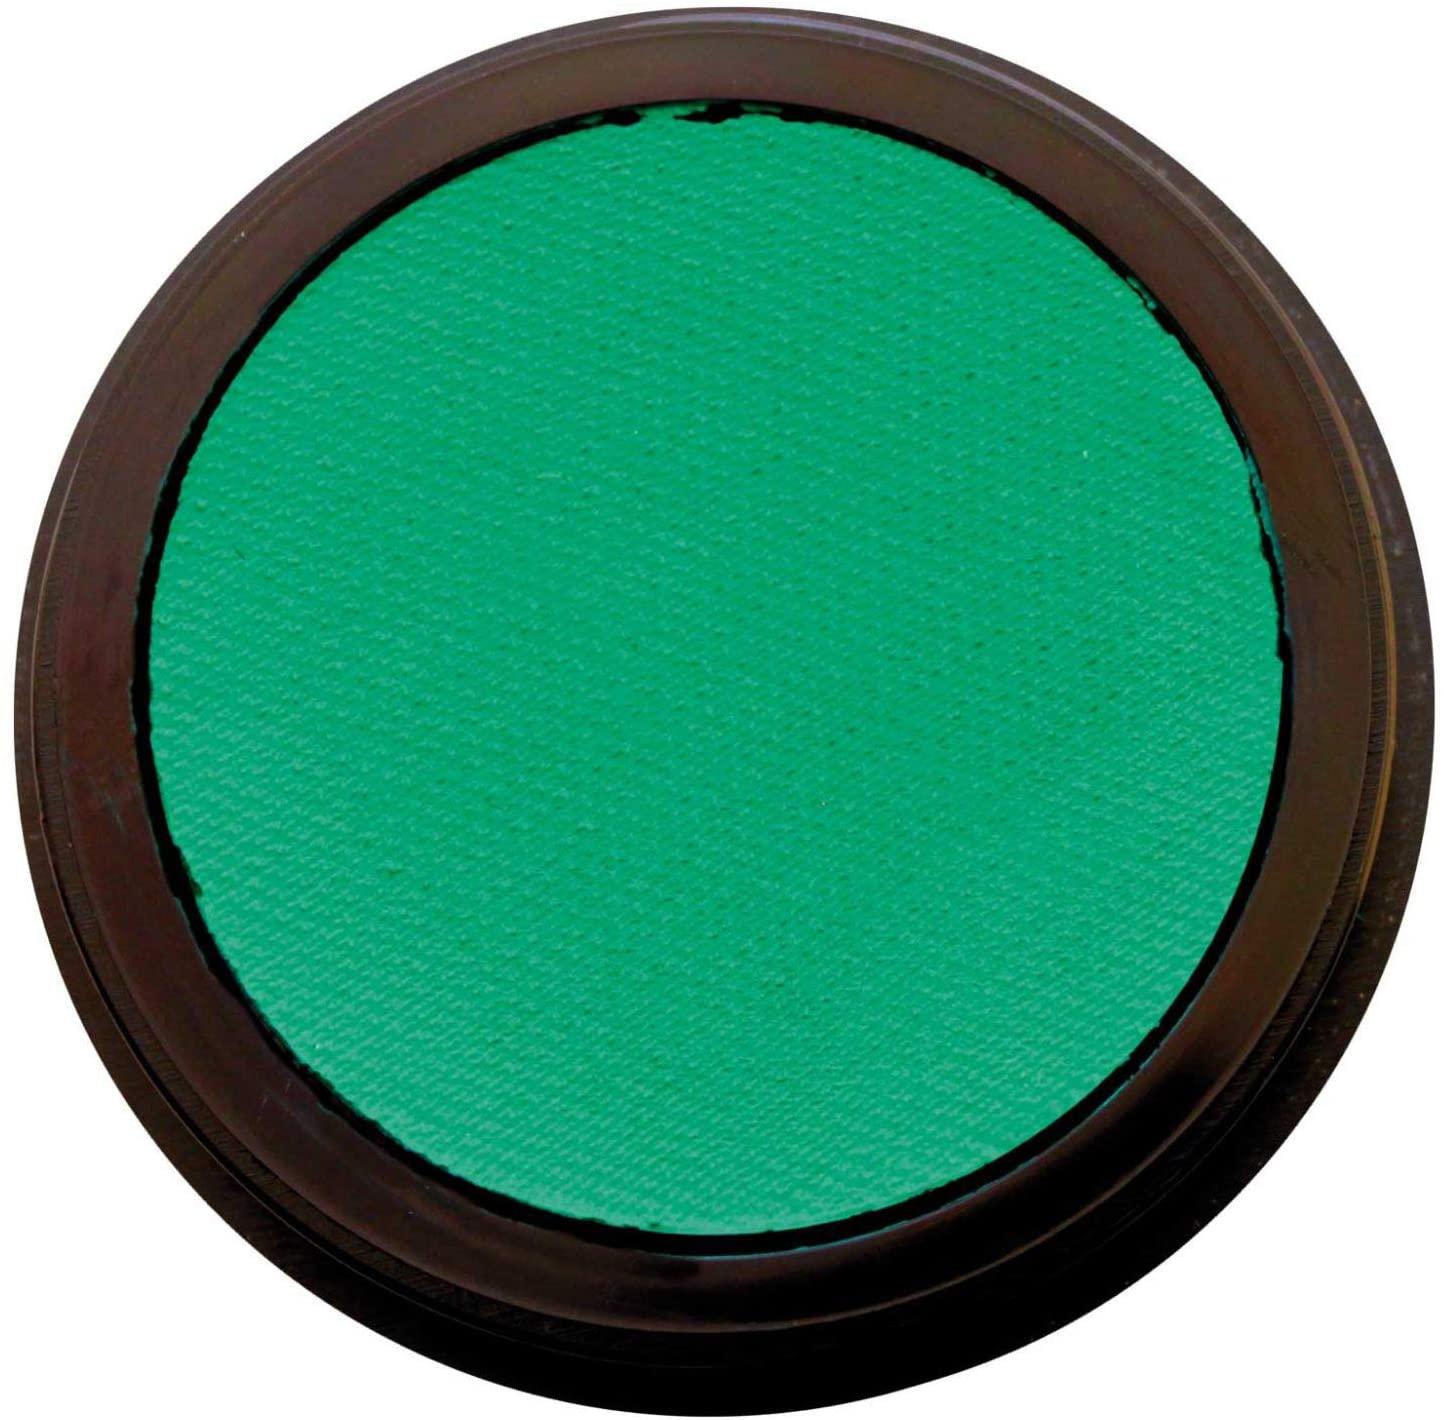 Eulenspiegel 184783 Forest Green 20 ml/30 g Professional Aqua Make-Up